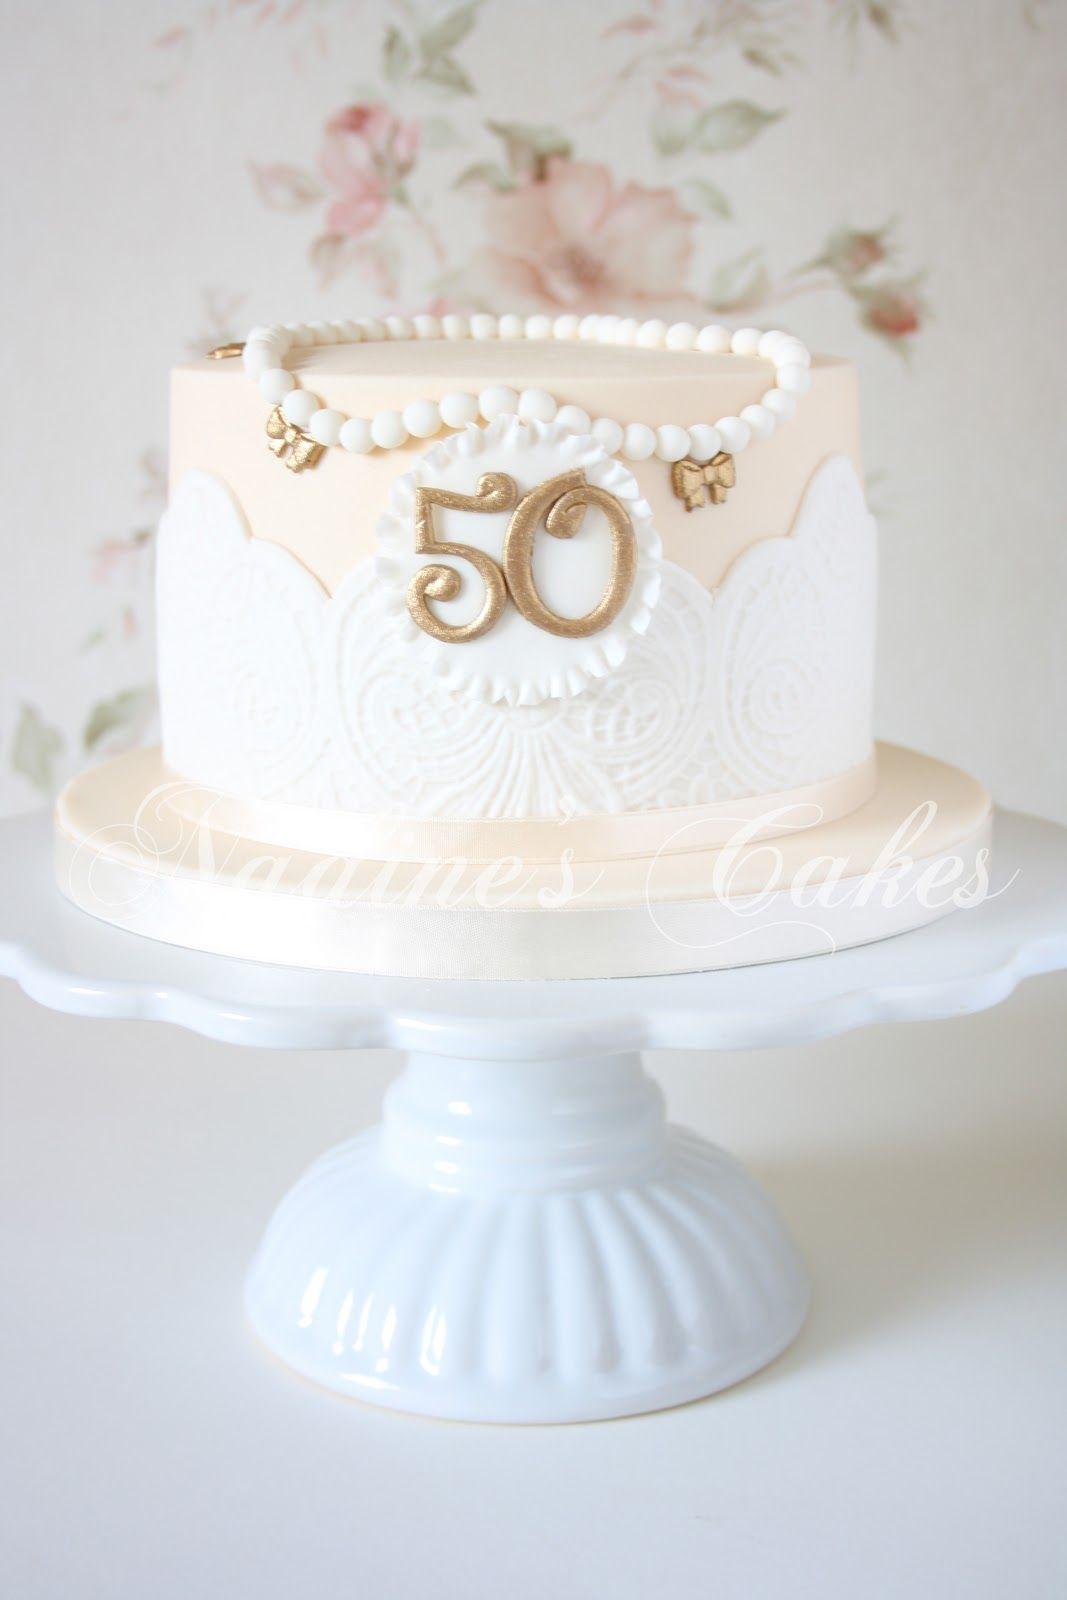 Nadine\'s Cakes & My little white home | อาหาร | Pinterest | Cake and ...